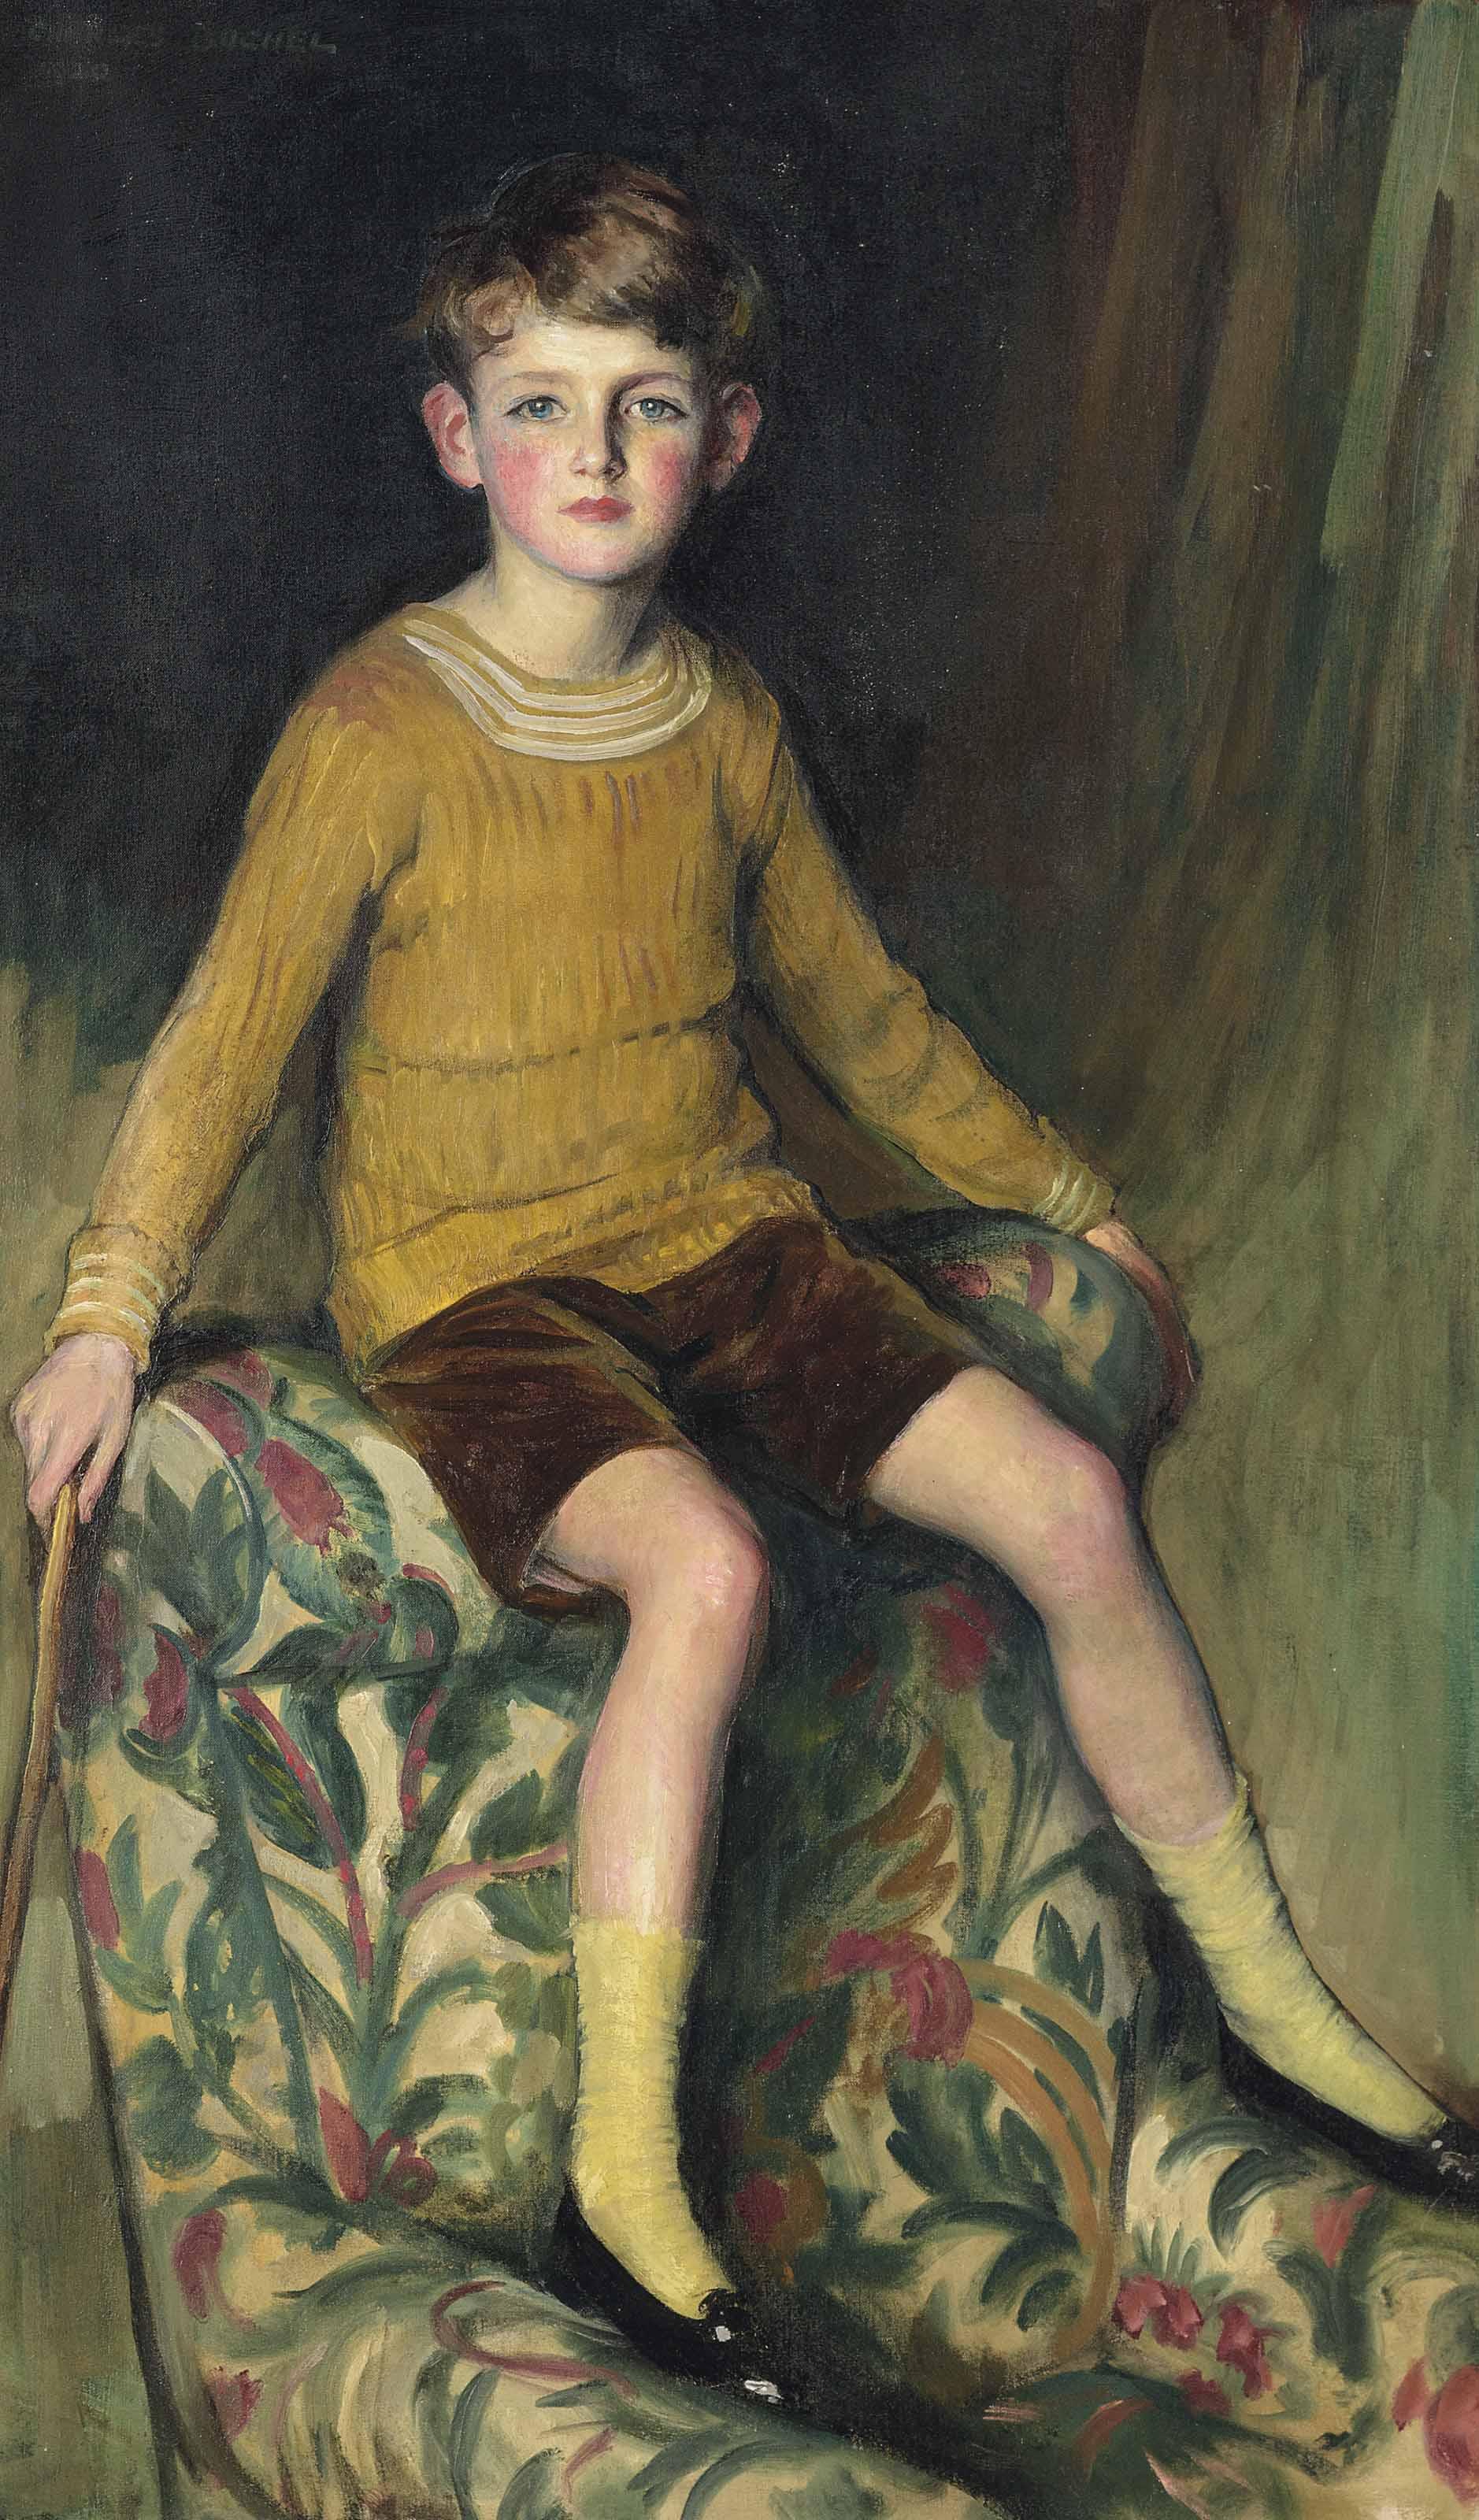 Portrait of the artist's son, Philip Buchel